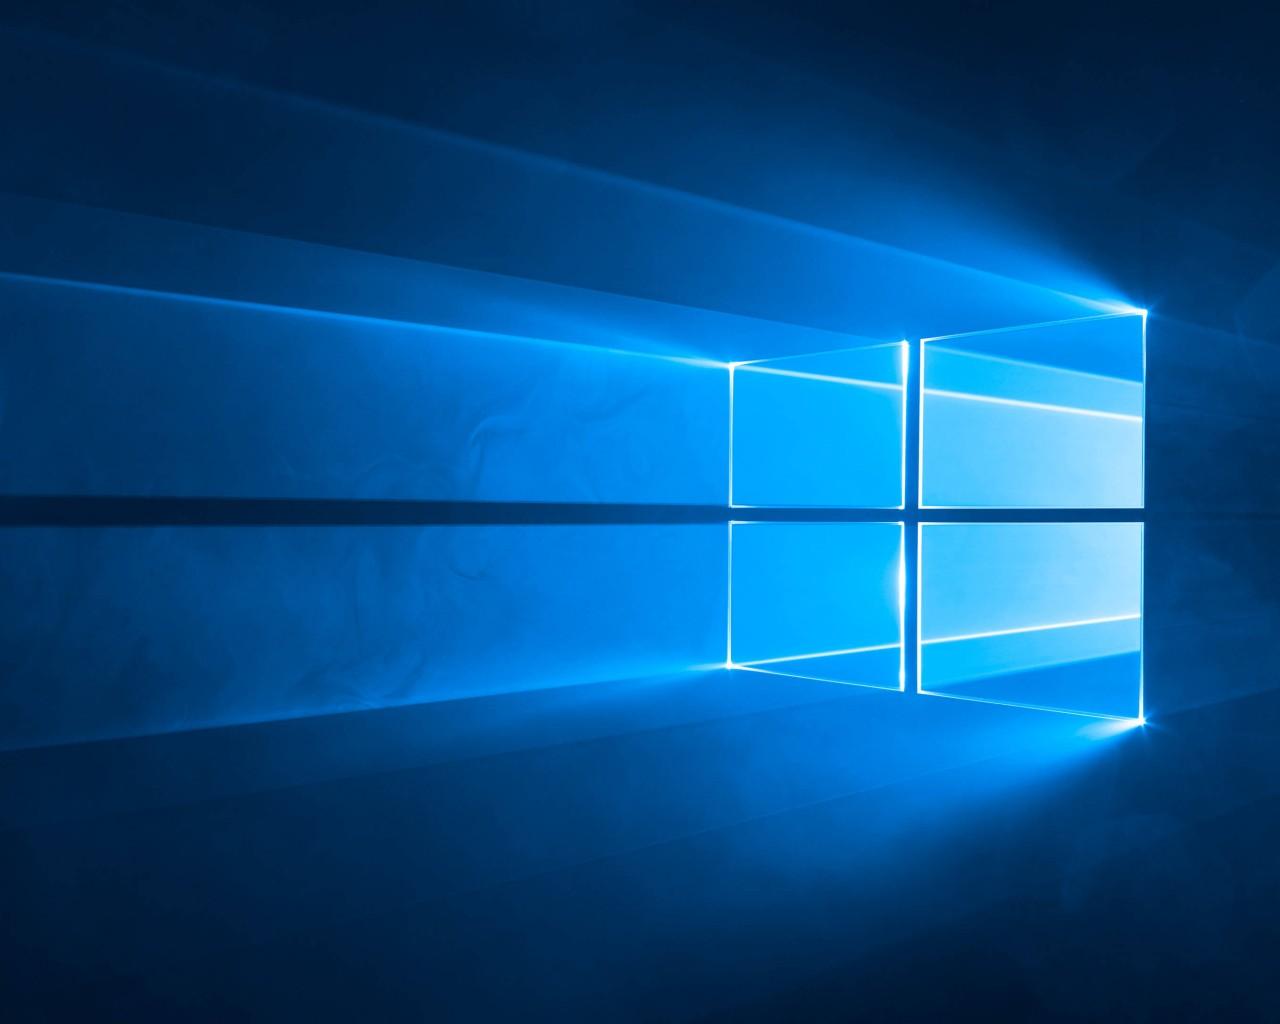 45 Windows 10 Wallpaper 1280x1024 On Wallpapersafari